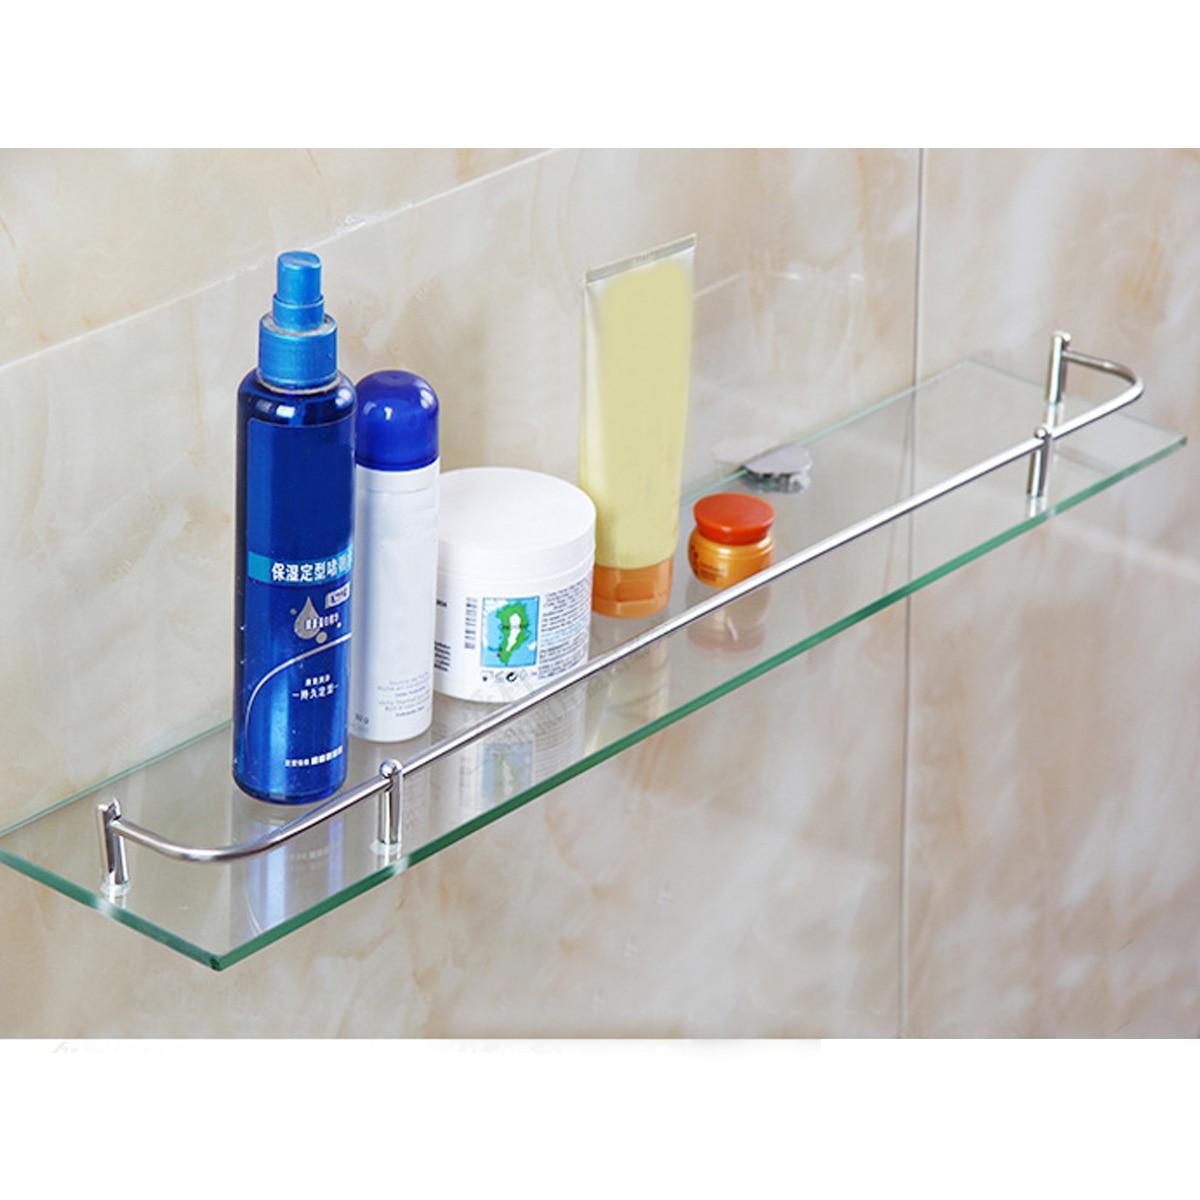 Glass Bathroom Shower Holder For Shampoos Bath Gel Kitchen Home Balcony Shelf Hanging Storage Rack Wall Mount Hardware 50*12cm